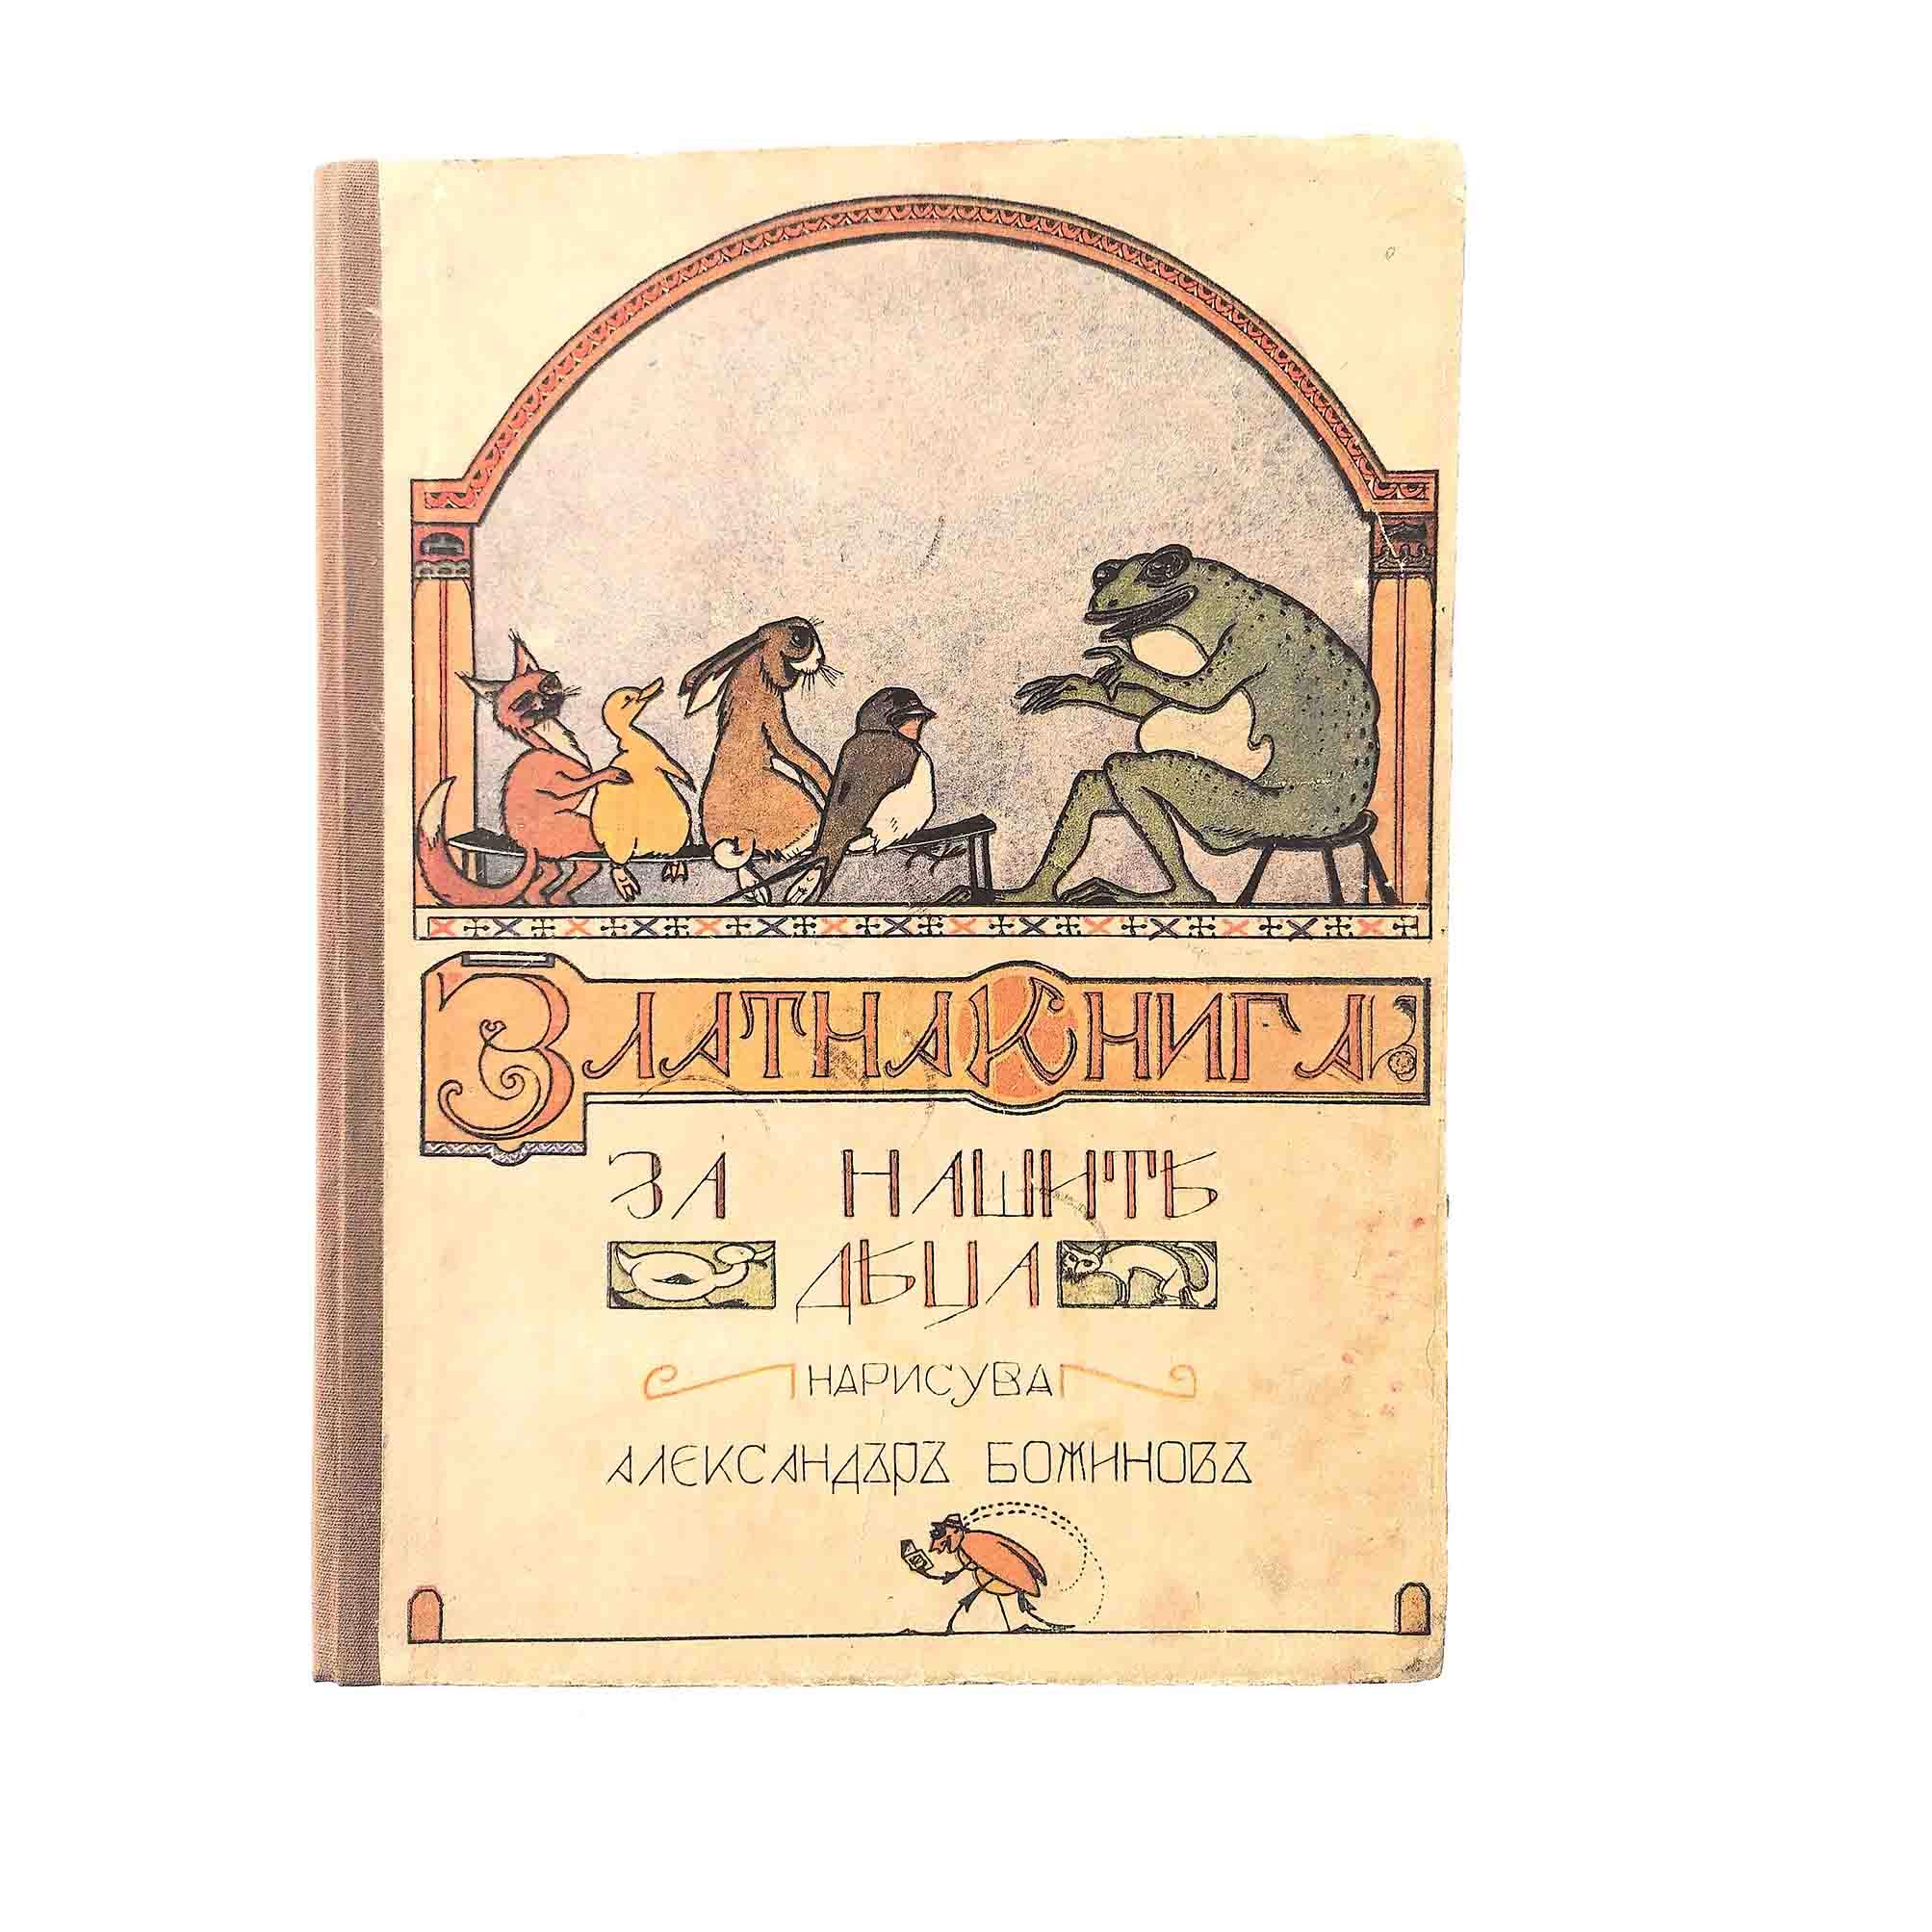 5964 Bozhinov Zlatna Kniga 1921 Cover Recto free N